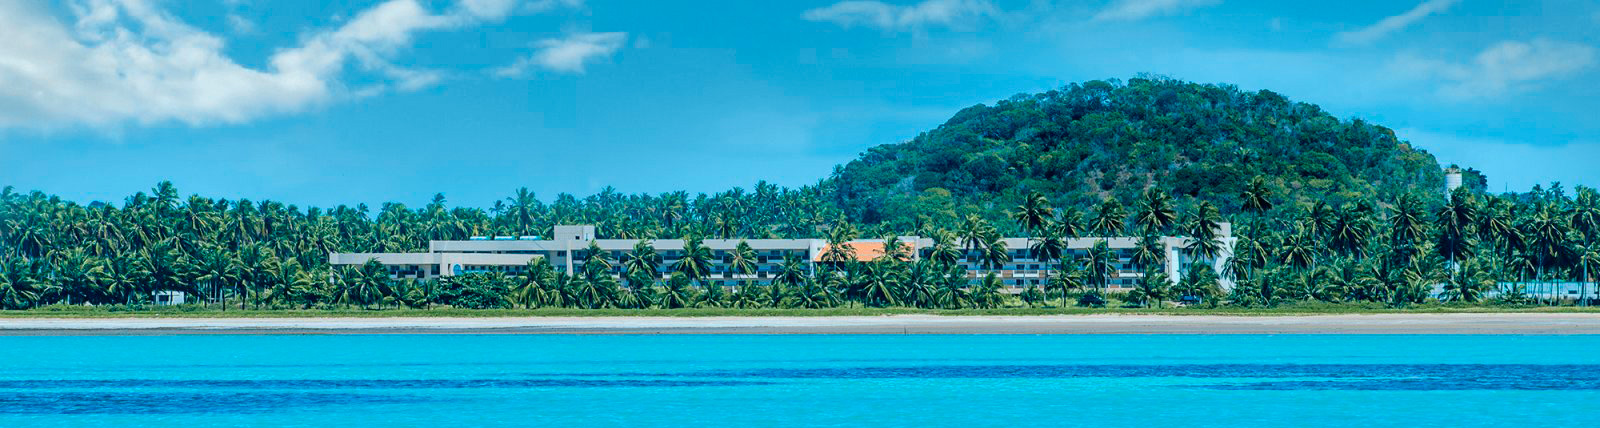 japaratinga-lounge-resort-praia-fachada